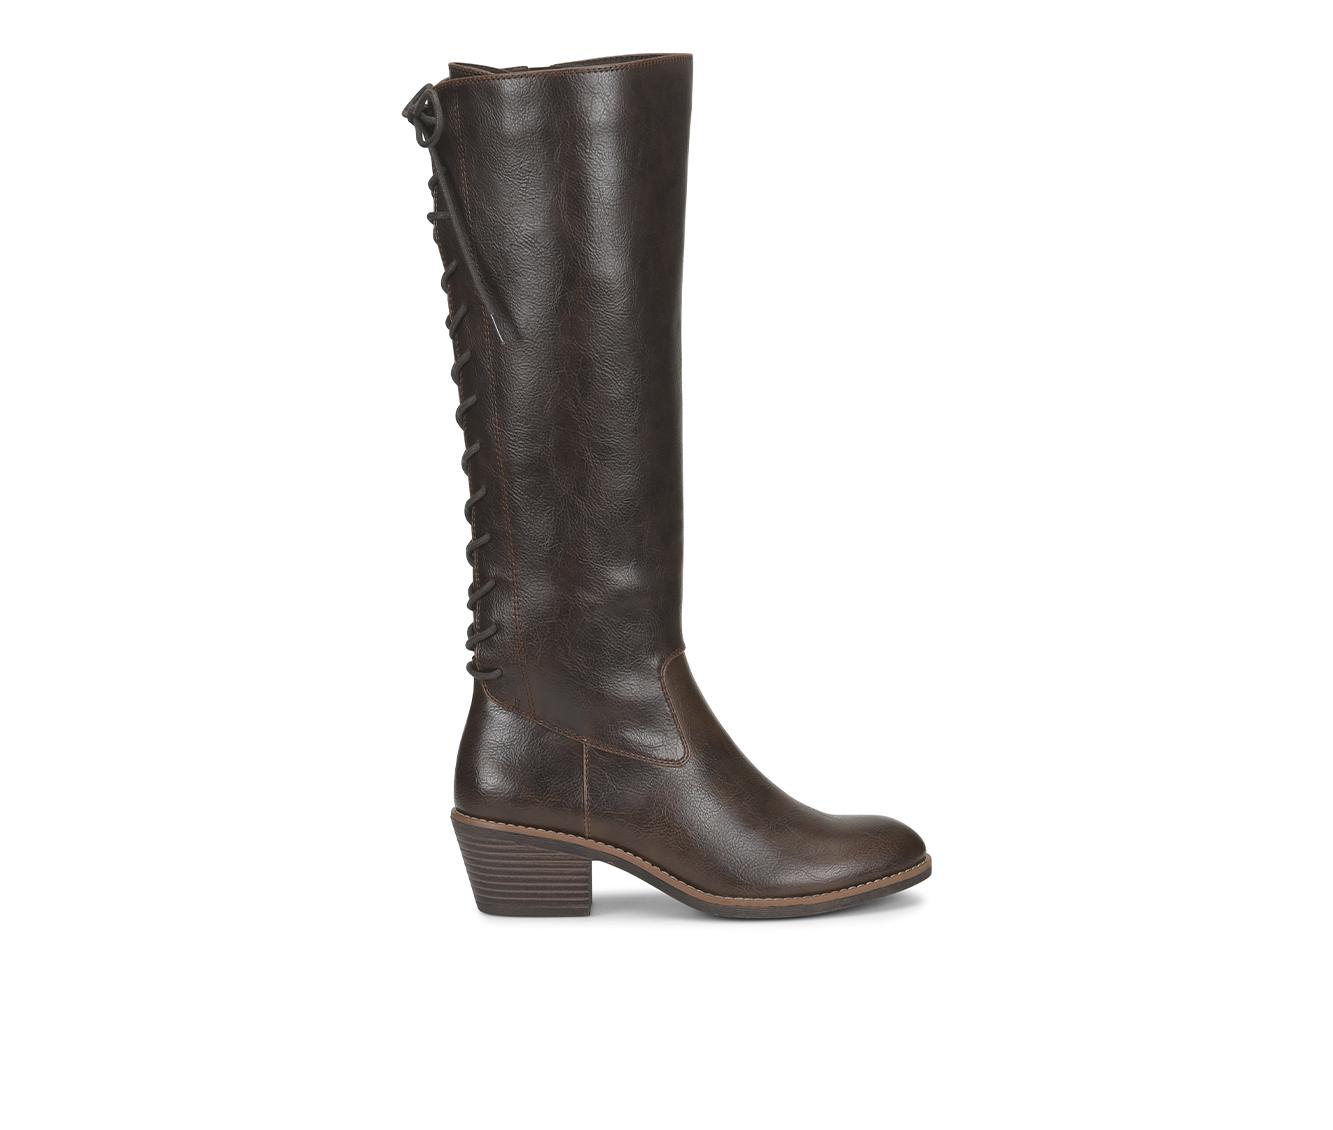 EuroSoft Carlen Women's Boots (Brown - Faux Leather)